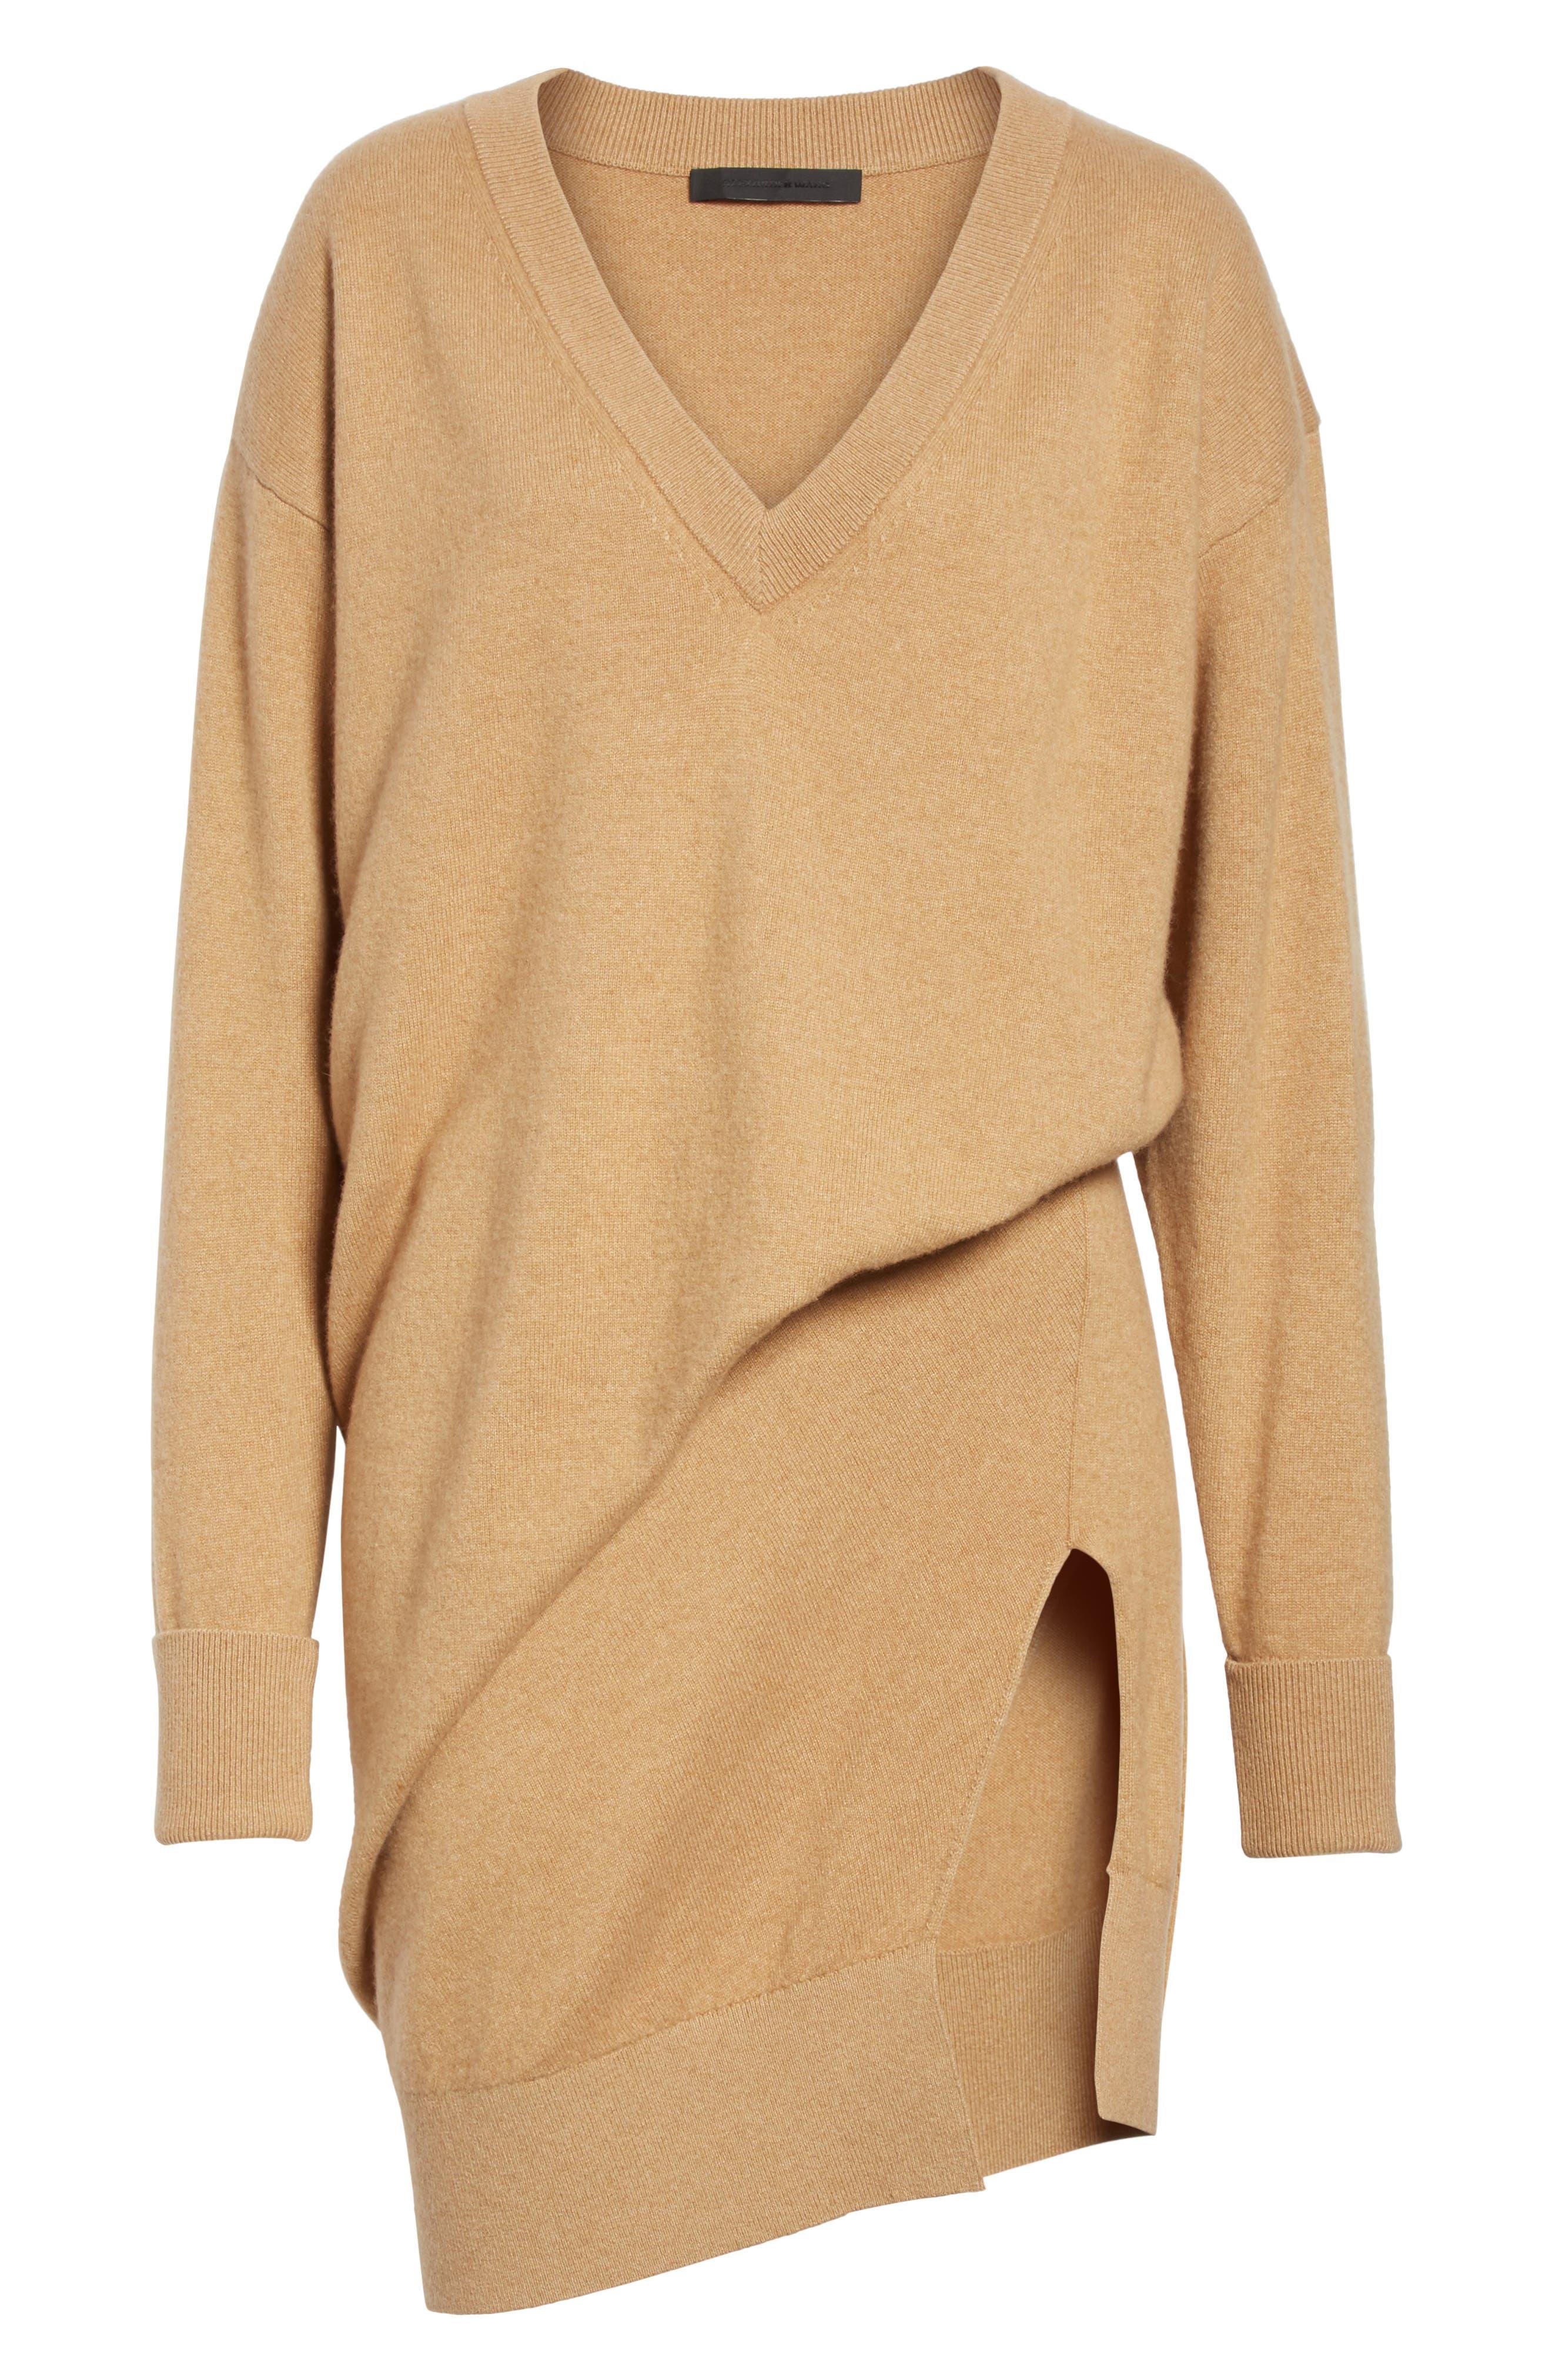 Asymmetrical Wool & Cashmere Blend Sweater Dress,                             Alternate thumbnail 6, color,                             204